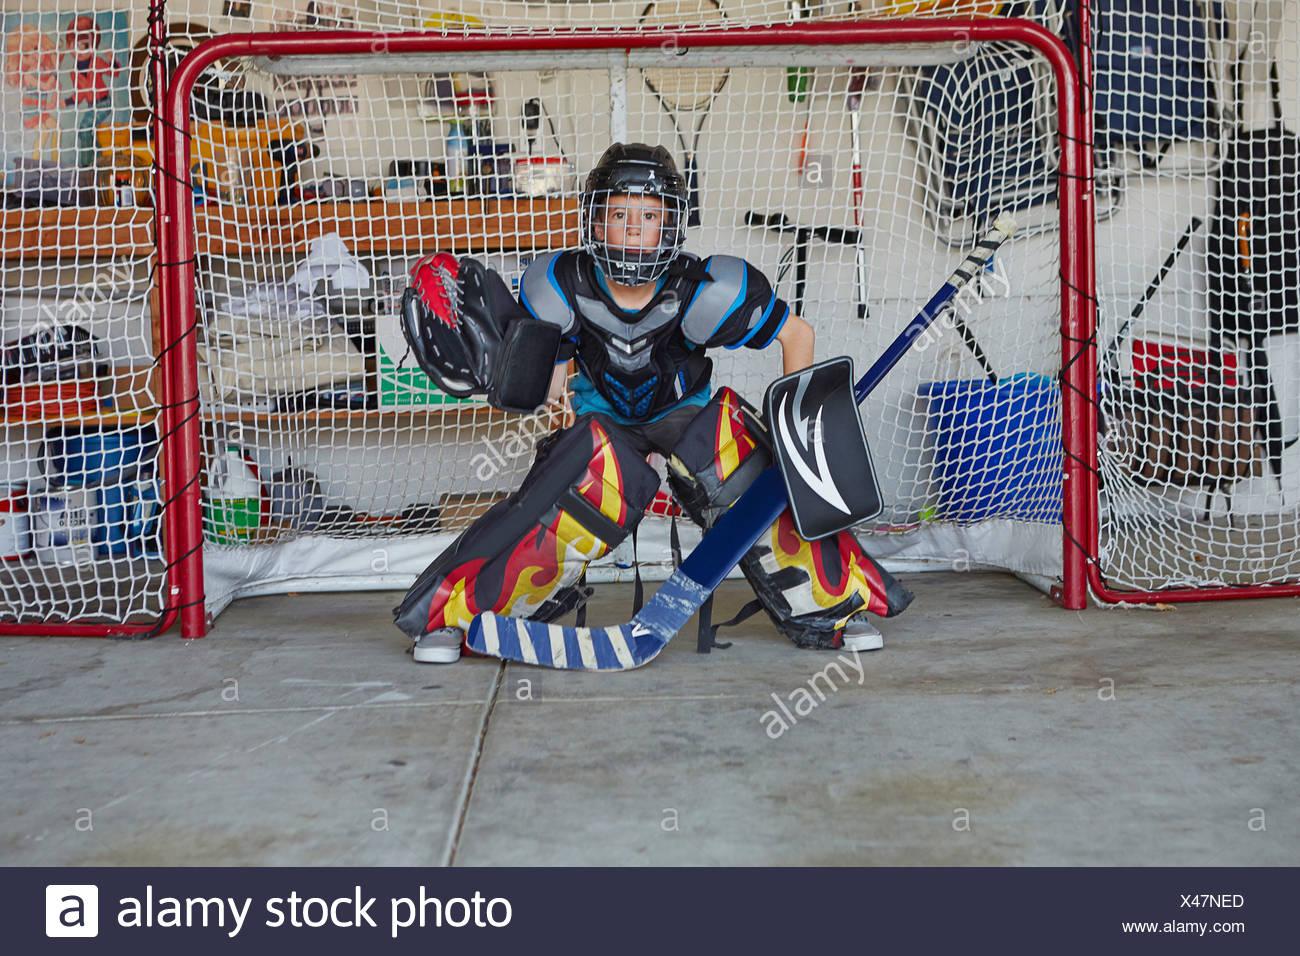 Boy in hockey goal wearing protective sportswear - Stock Image